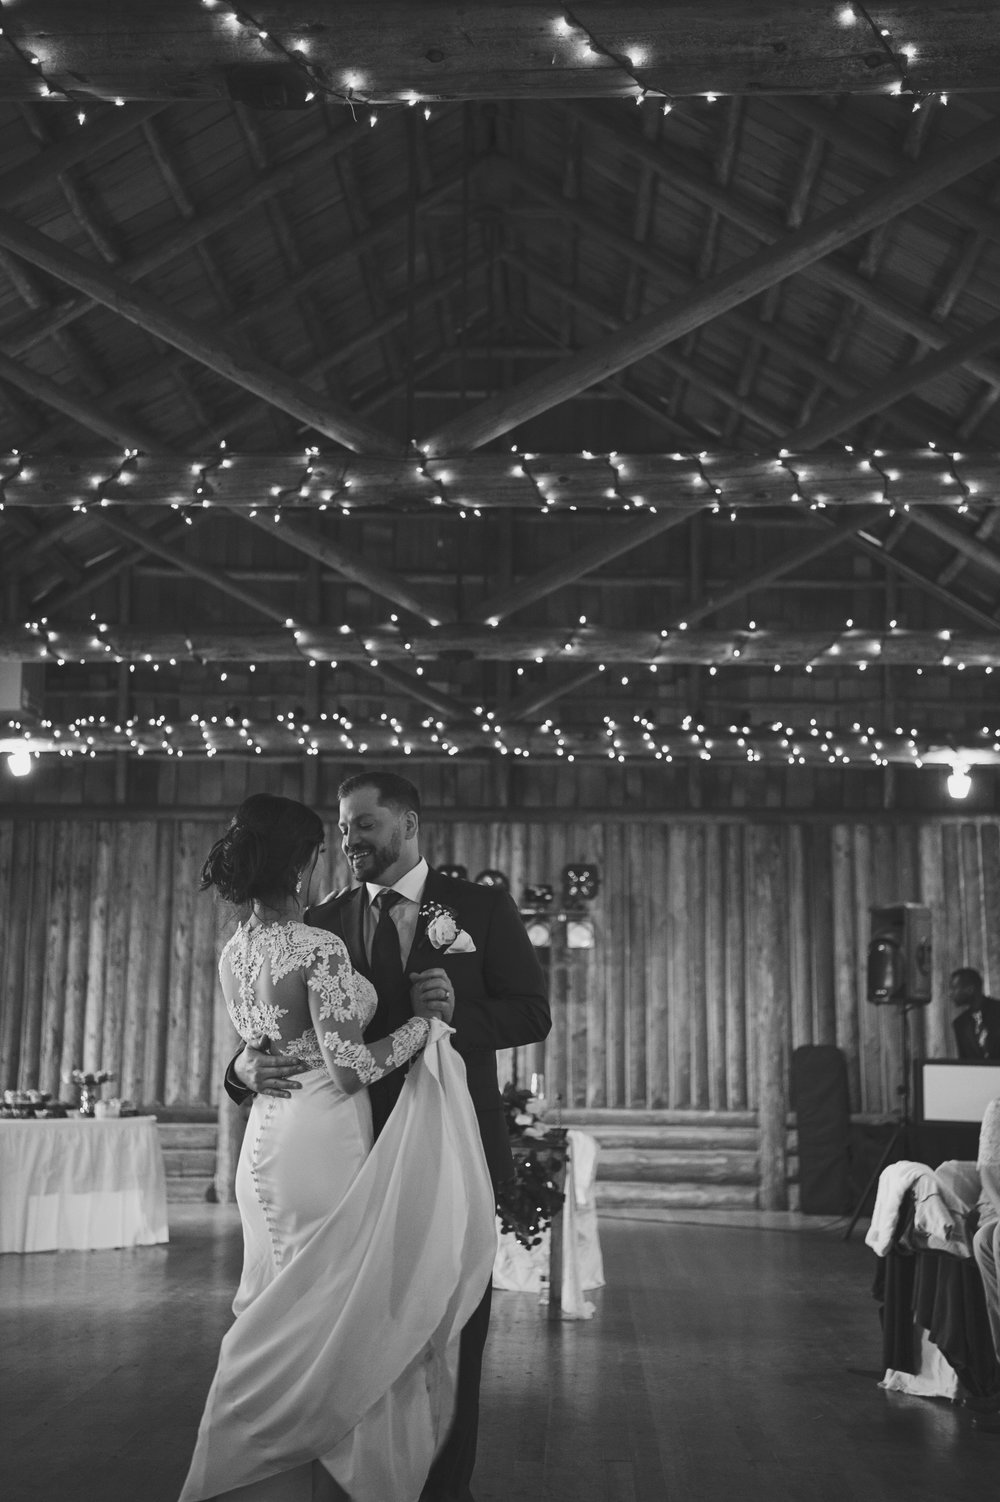 Kim La Plante + Nick Samet_Poulsbo Wedding_Kitsap Memorial Park Wedding_Kelsey Lane Photography-9890.jpg